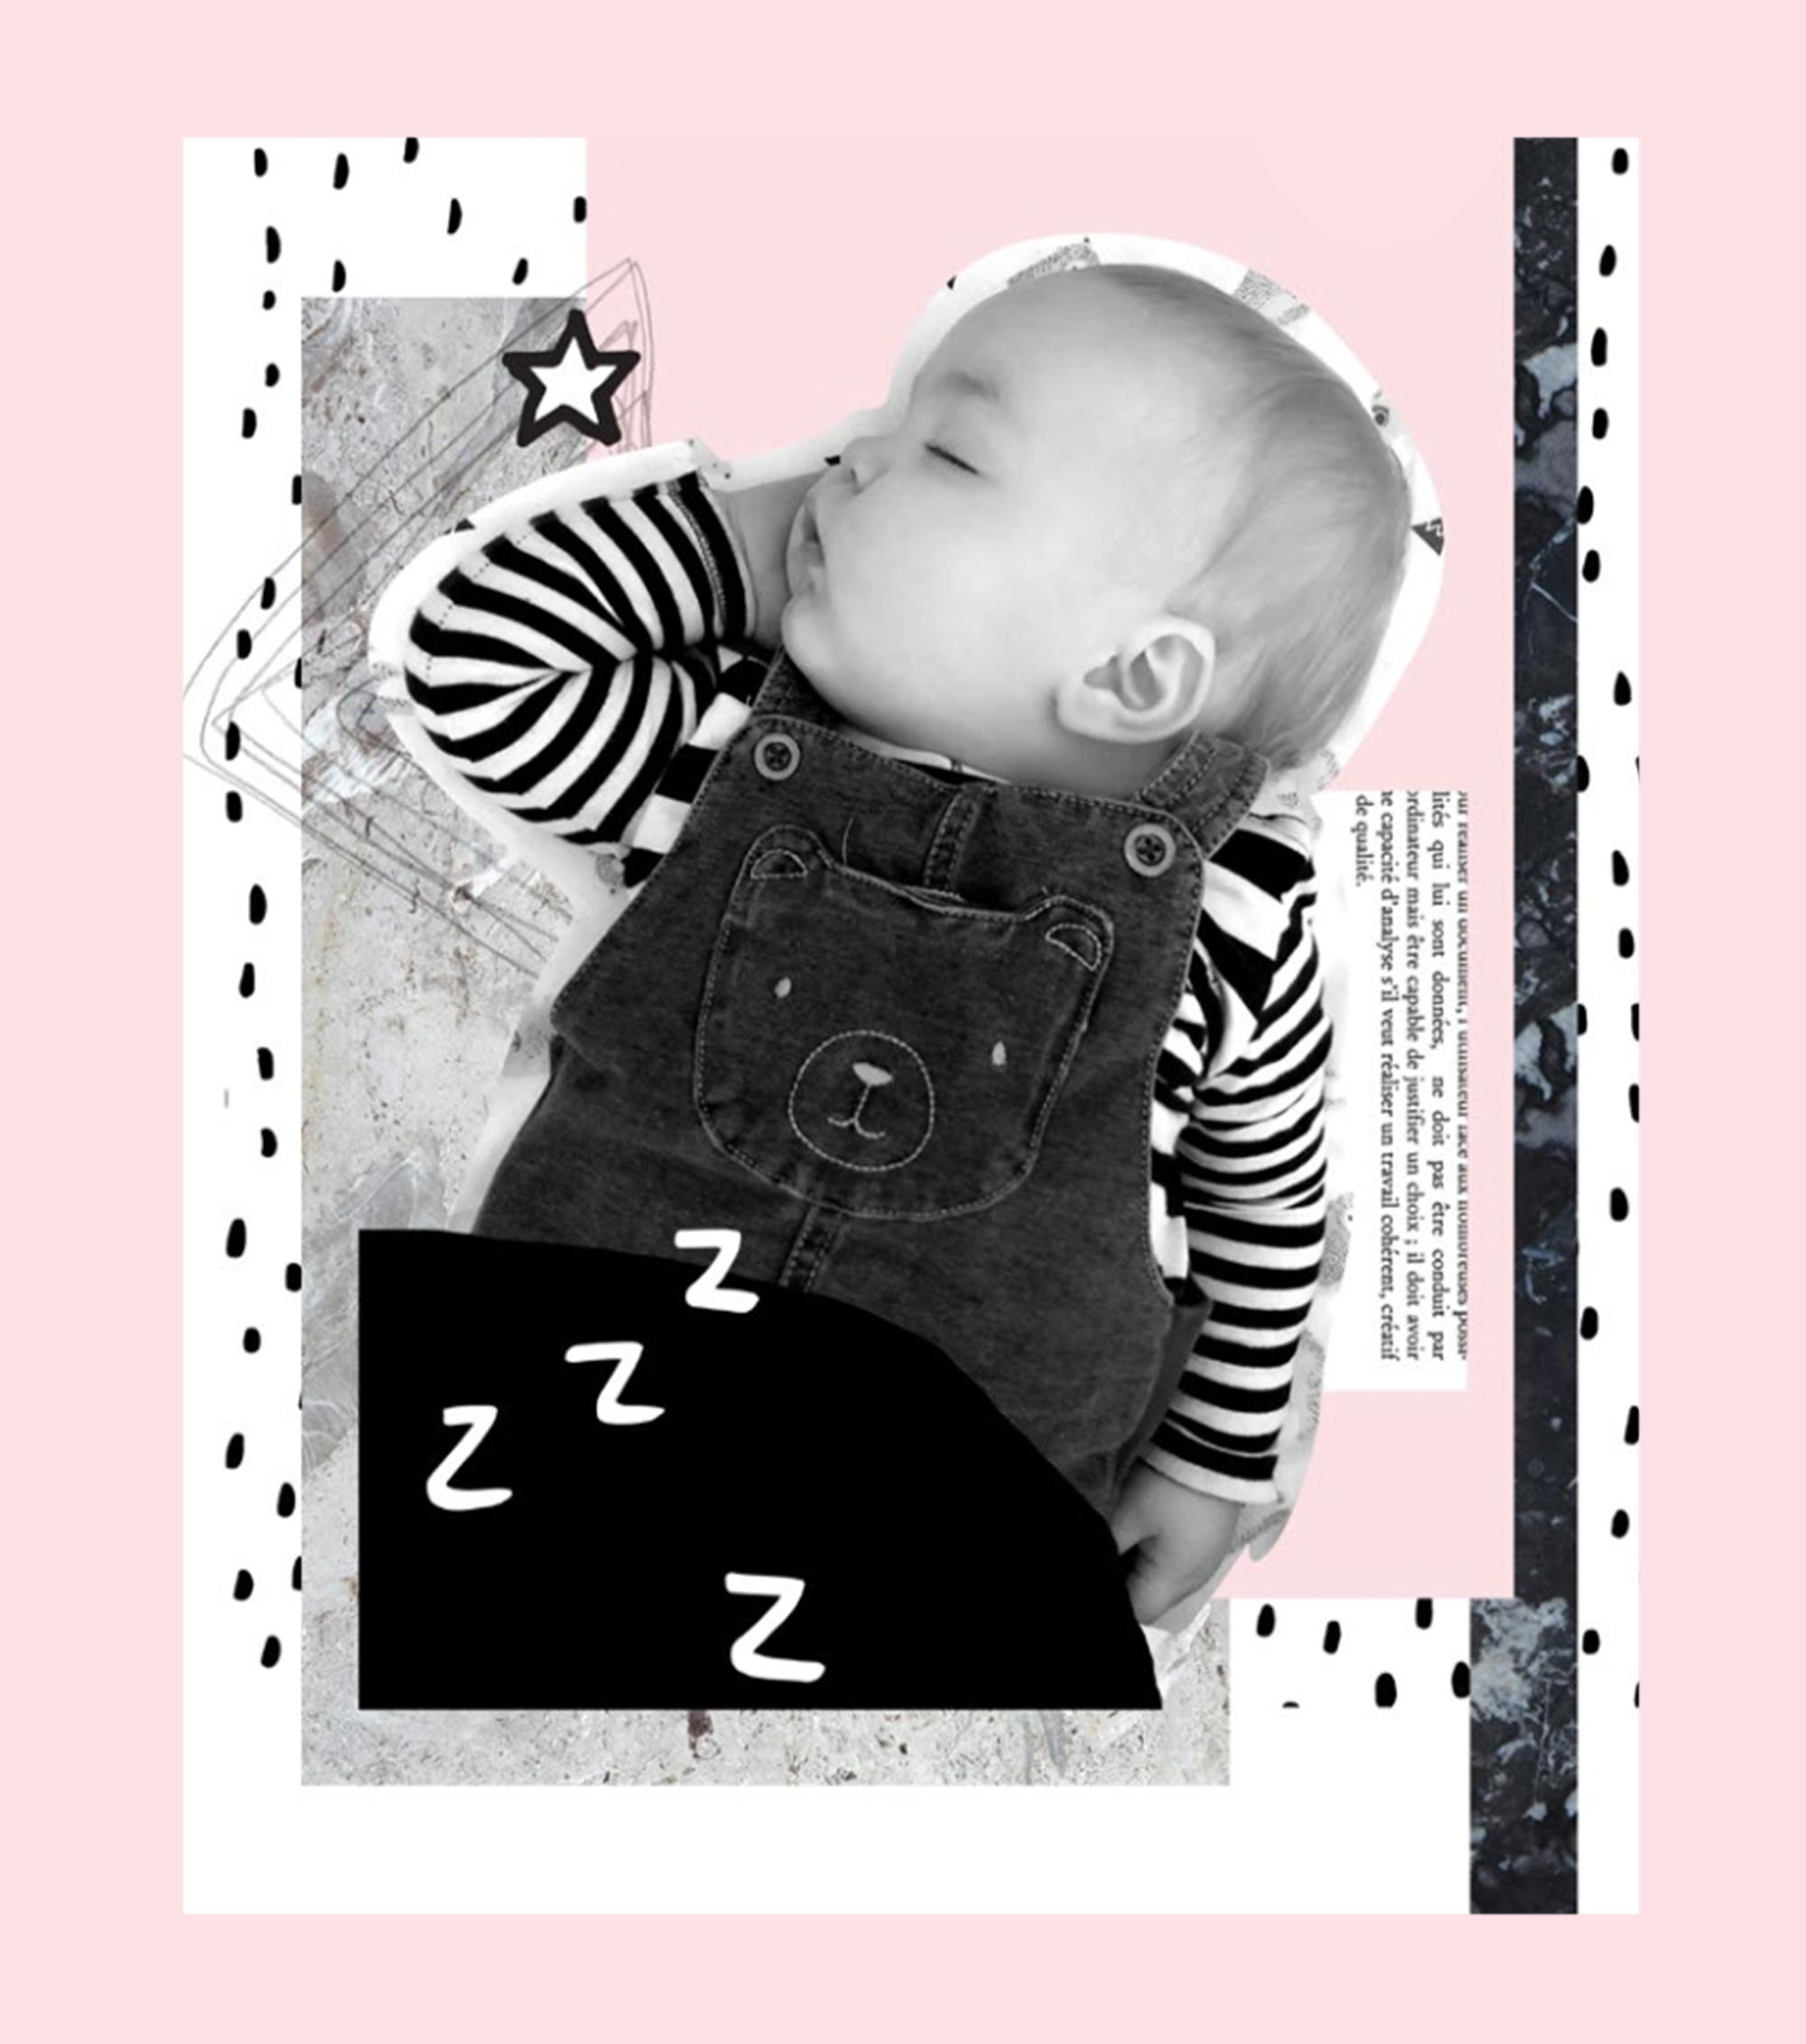 SLEEP PROGRAMS - 12 - 24 MONTHS